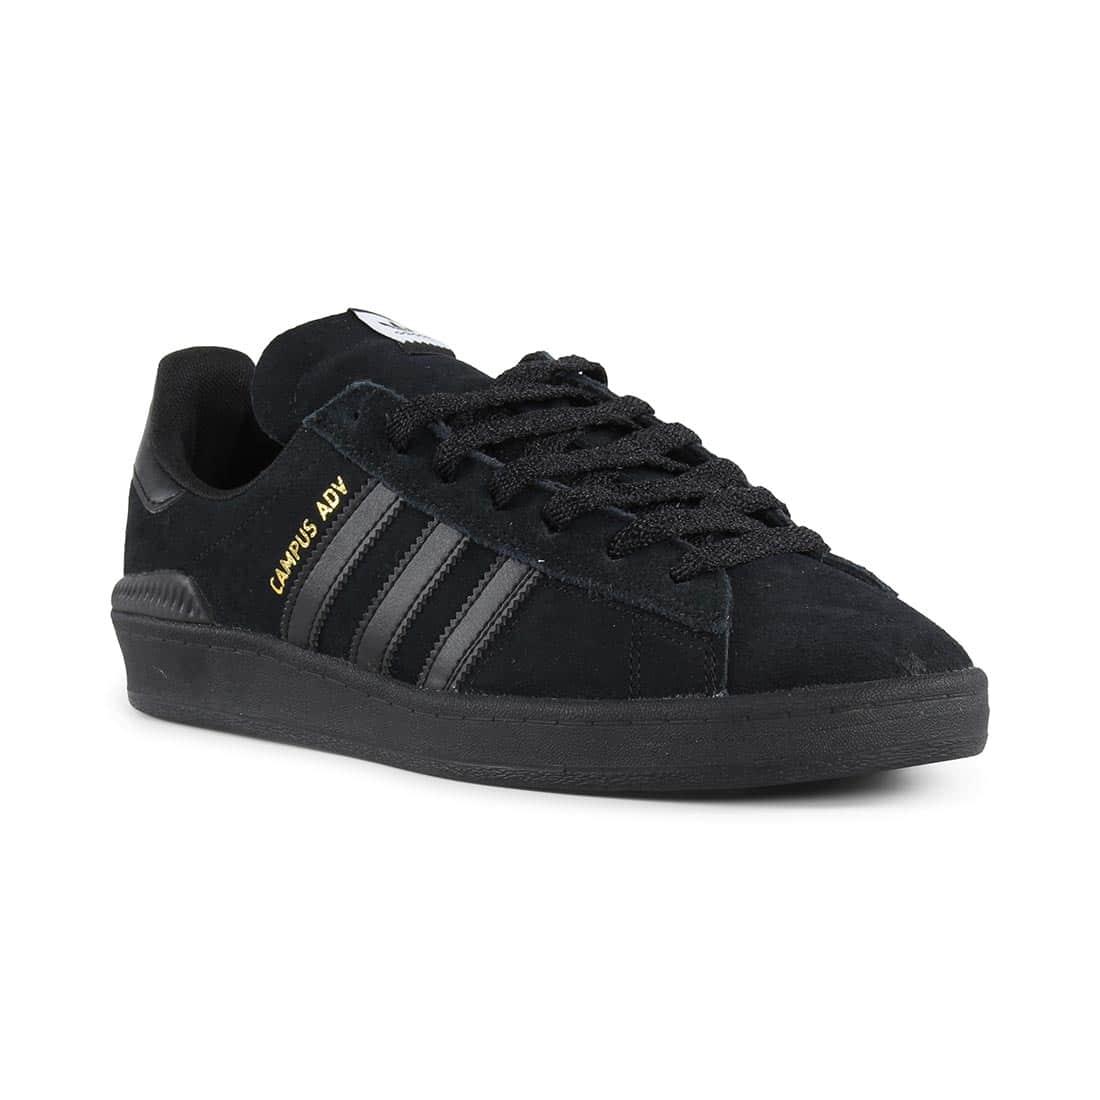 Adidas Campus ADV Shoes - Core Black